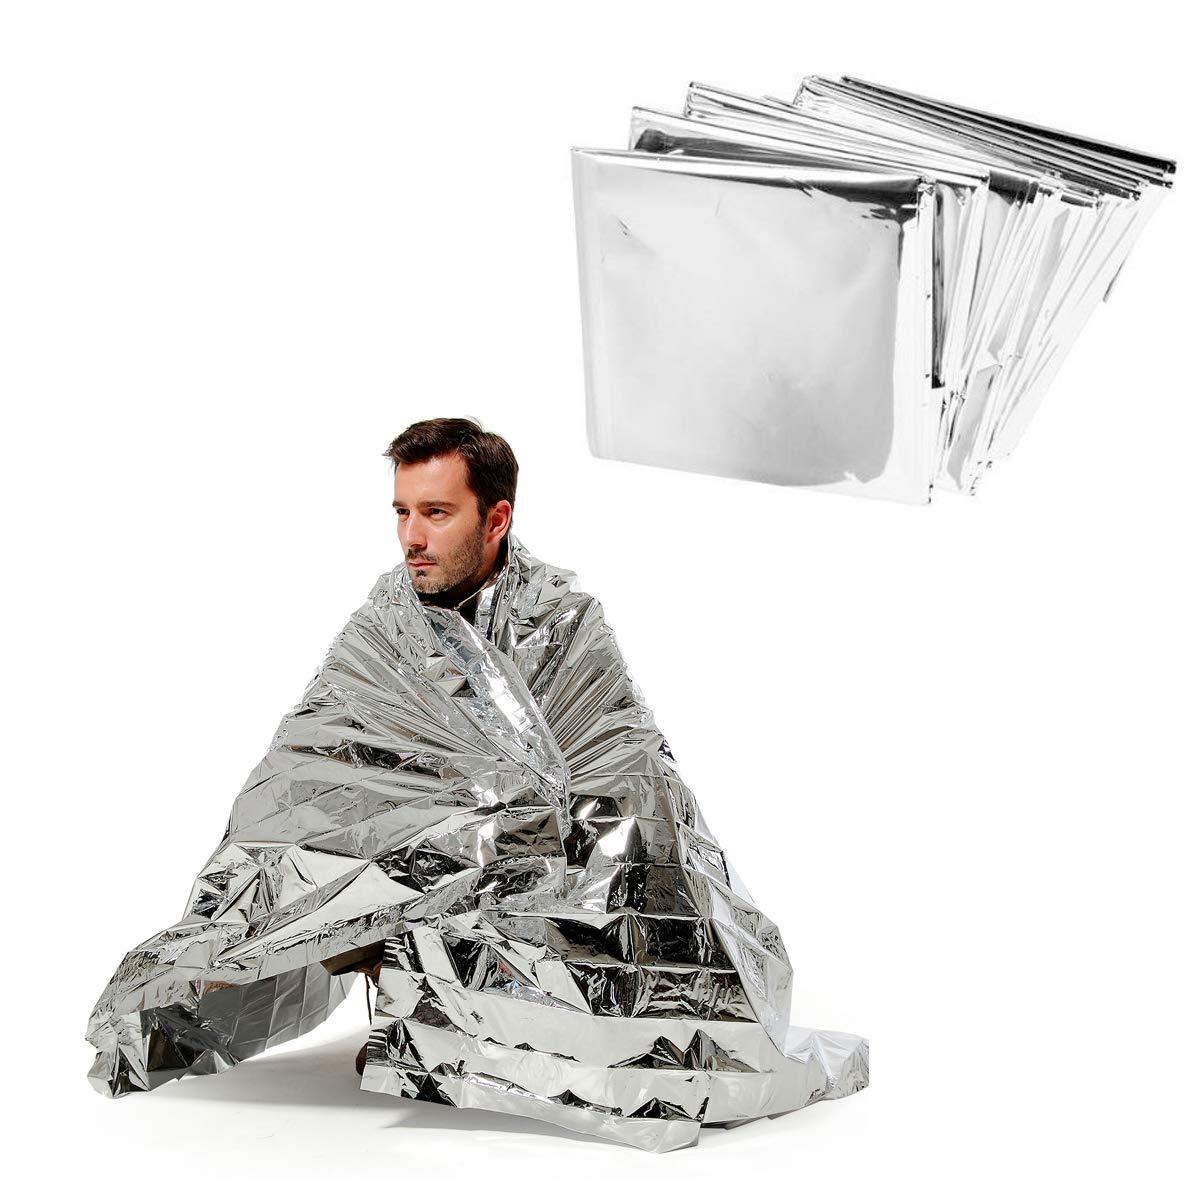 ANGTUO Manta té rmica reflectante de emergencia, supervivencia y primeros auxilios, 5 unidades, lá mina de color plata lámina de color plata